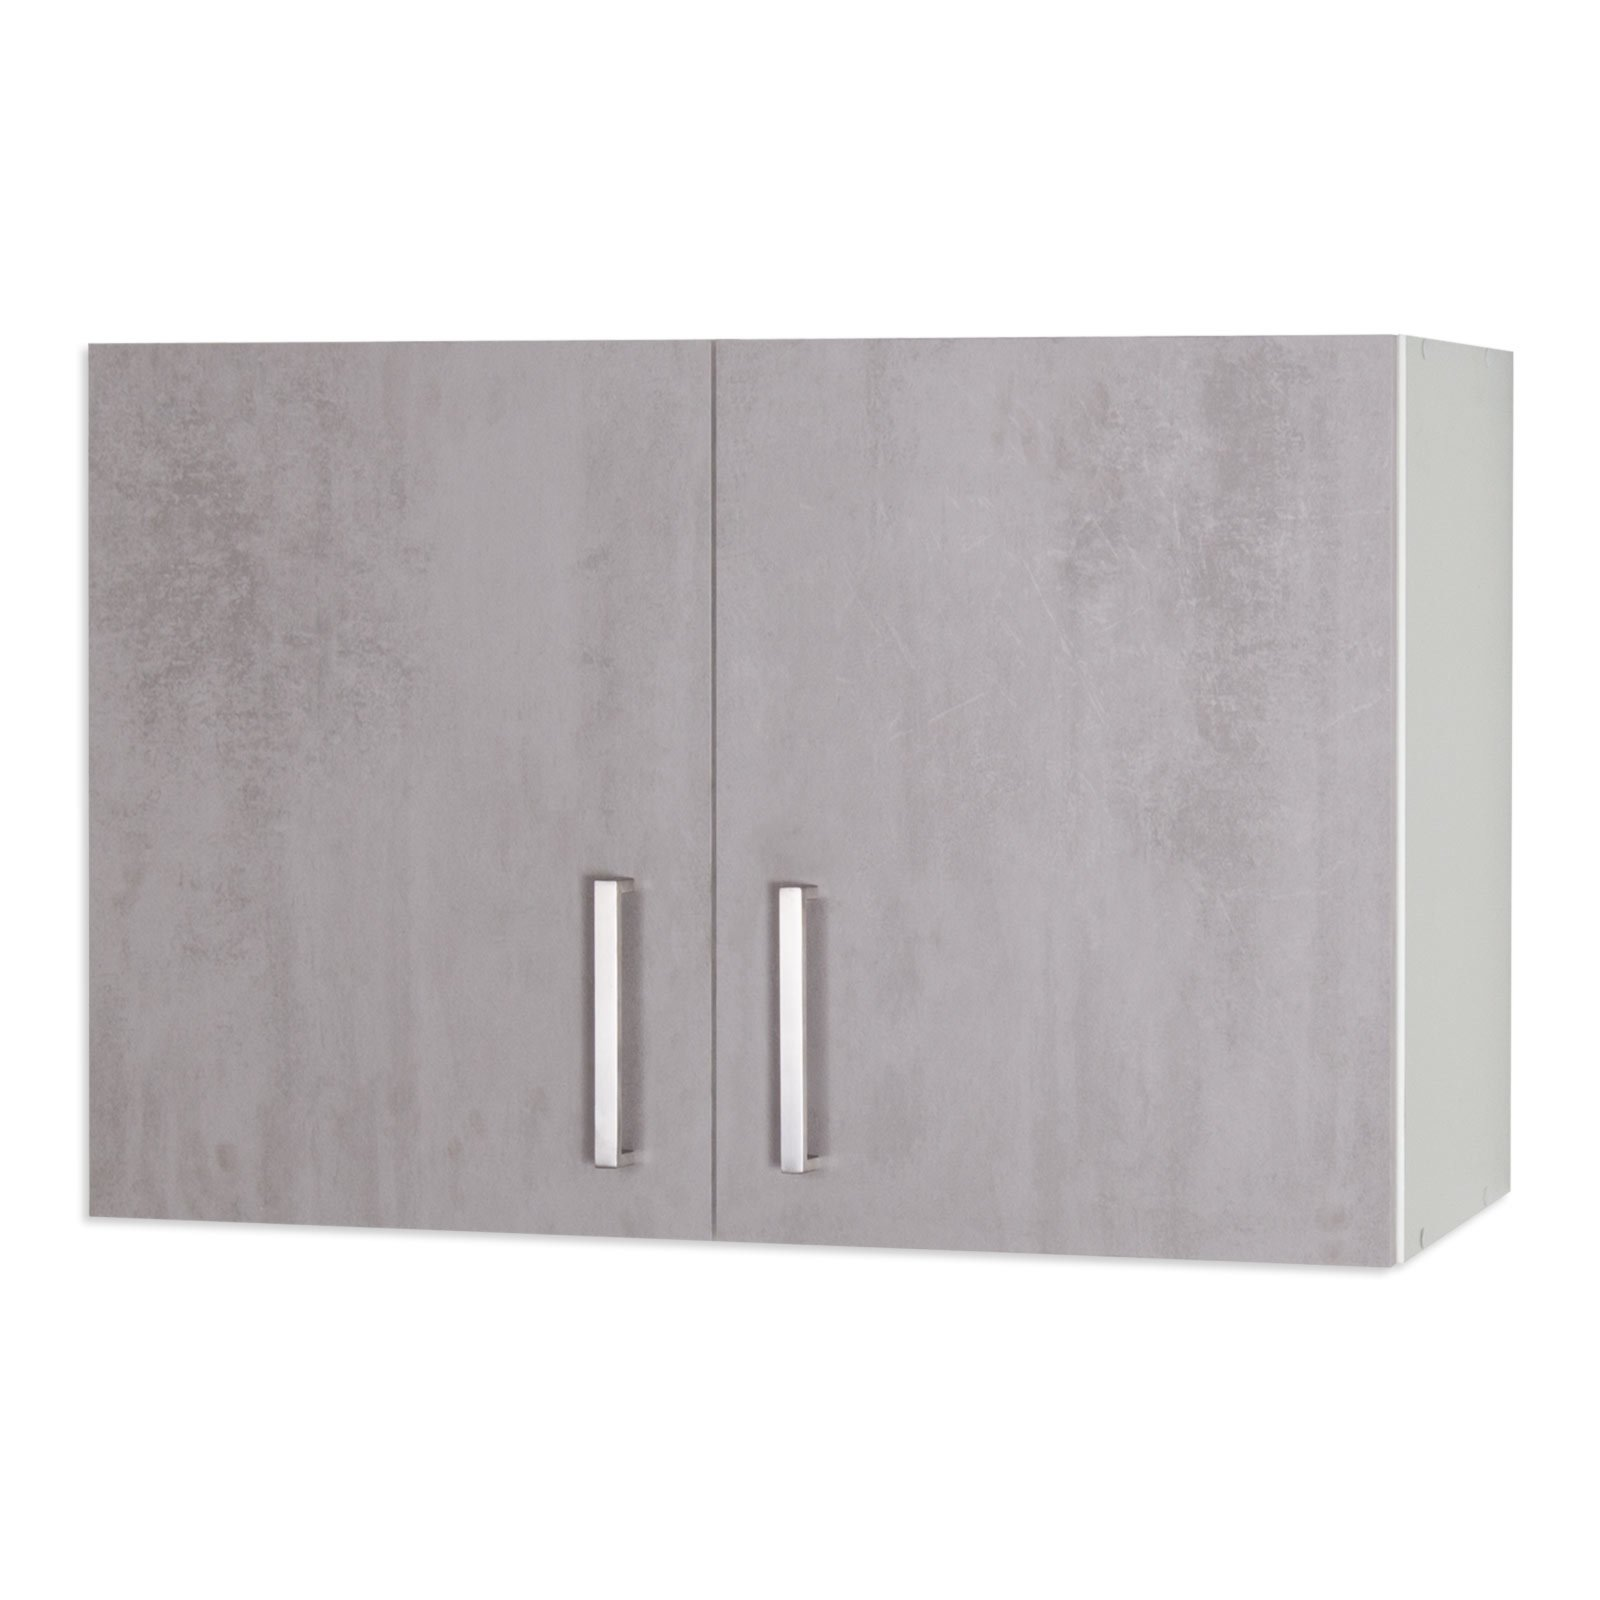 h ngeschrank marina betonoptik wei 100 cm h ngeschr nke einzelschr nke k chenschr nke. Black Bedroom Furniture Sets. Home Design Ideas